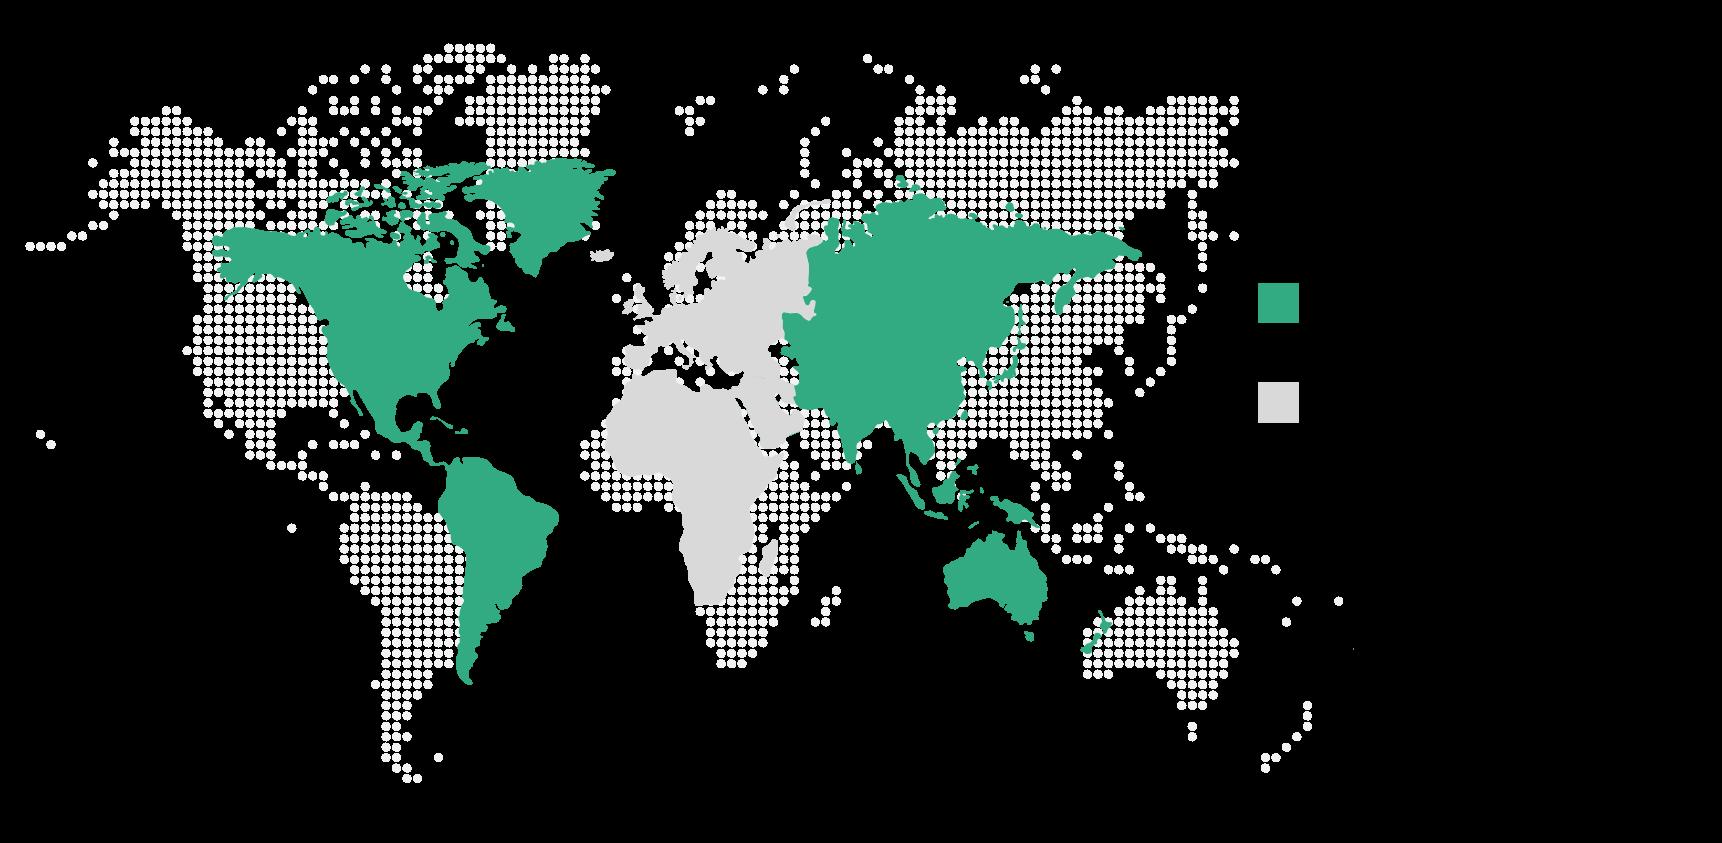 ascorbic-acid-market-share-by-region